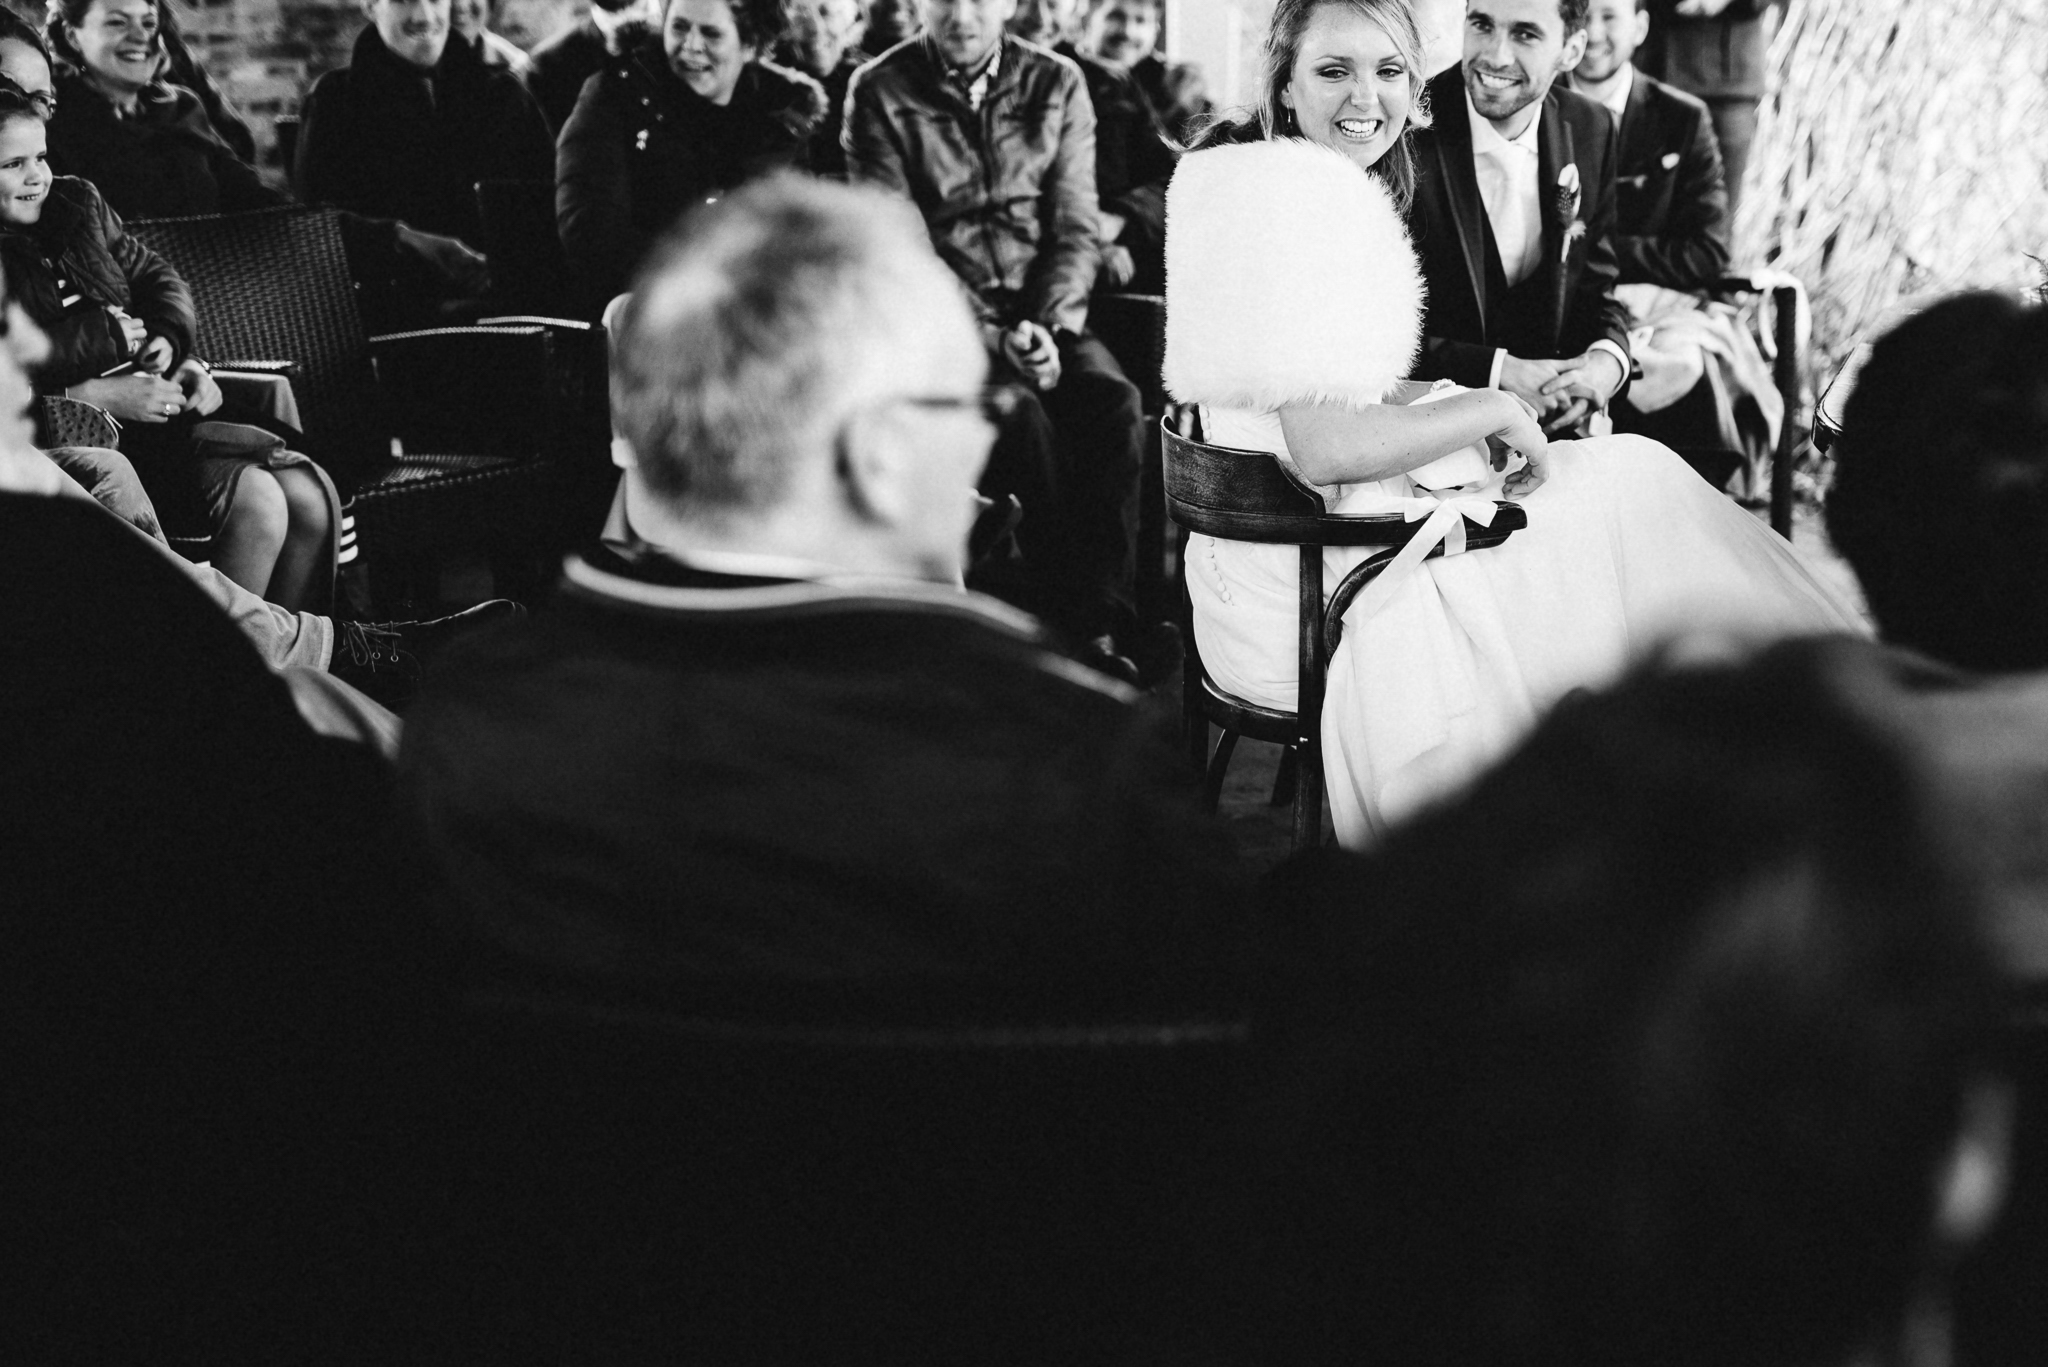 29 van 51 - trouwfotografie-gelske-reinier-friesland - 0594